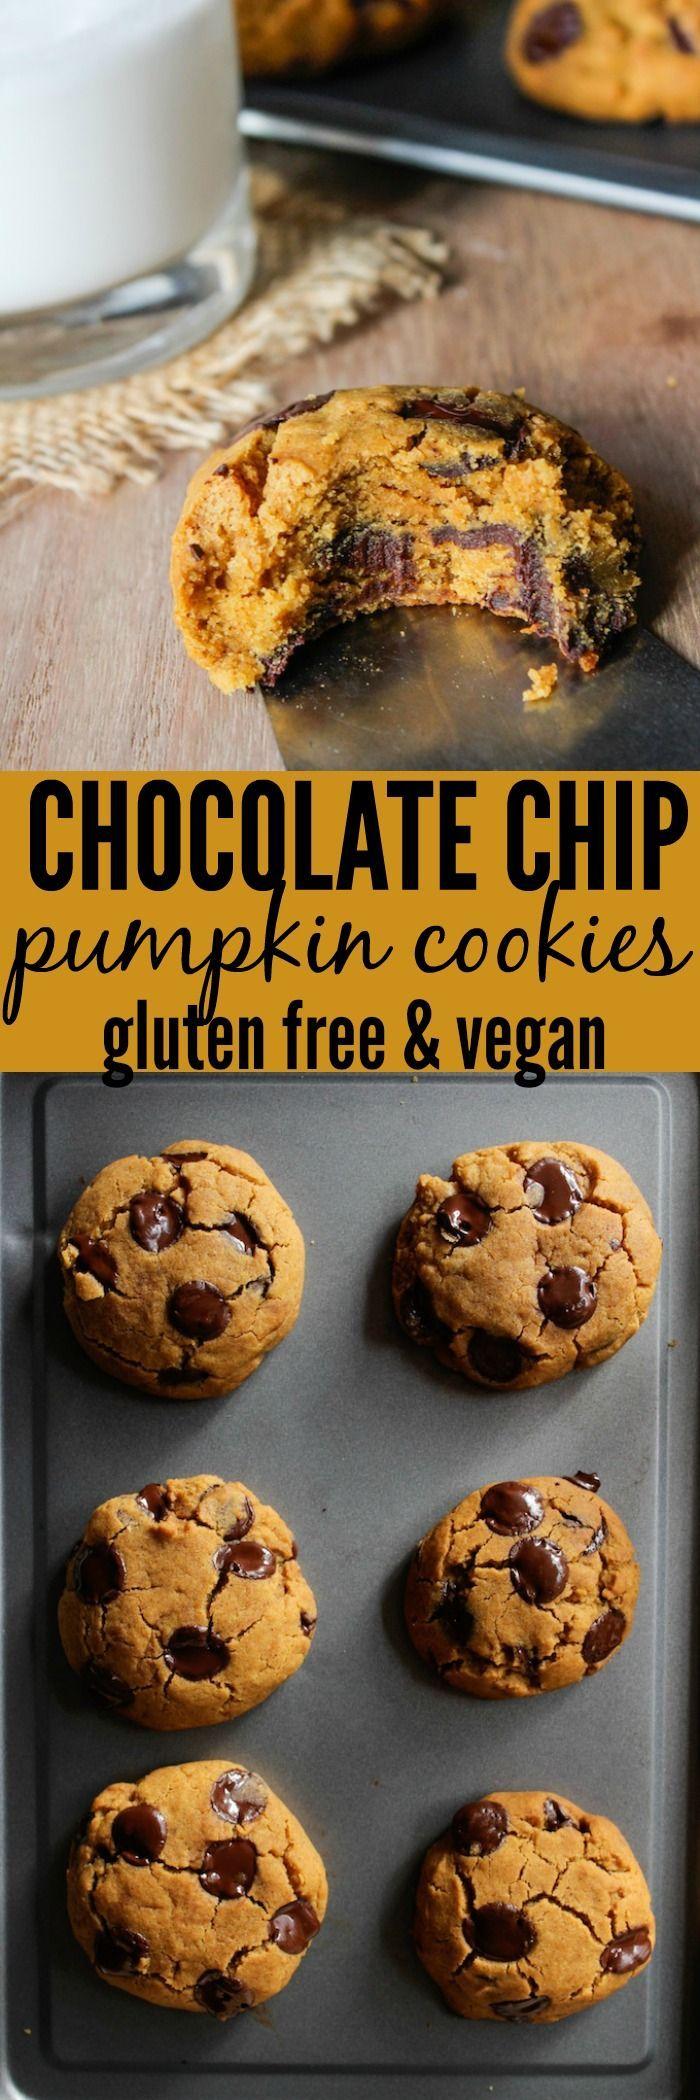 Recipe // Pumpkin Puree + Coconut Sugar + Baking Powder + Baking Soda + DF Chocolate Chips +  Cinnamon + Gluten Free Flour + Nutmeg + Salt + Vanilla Extract + Coconut Oil